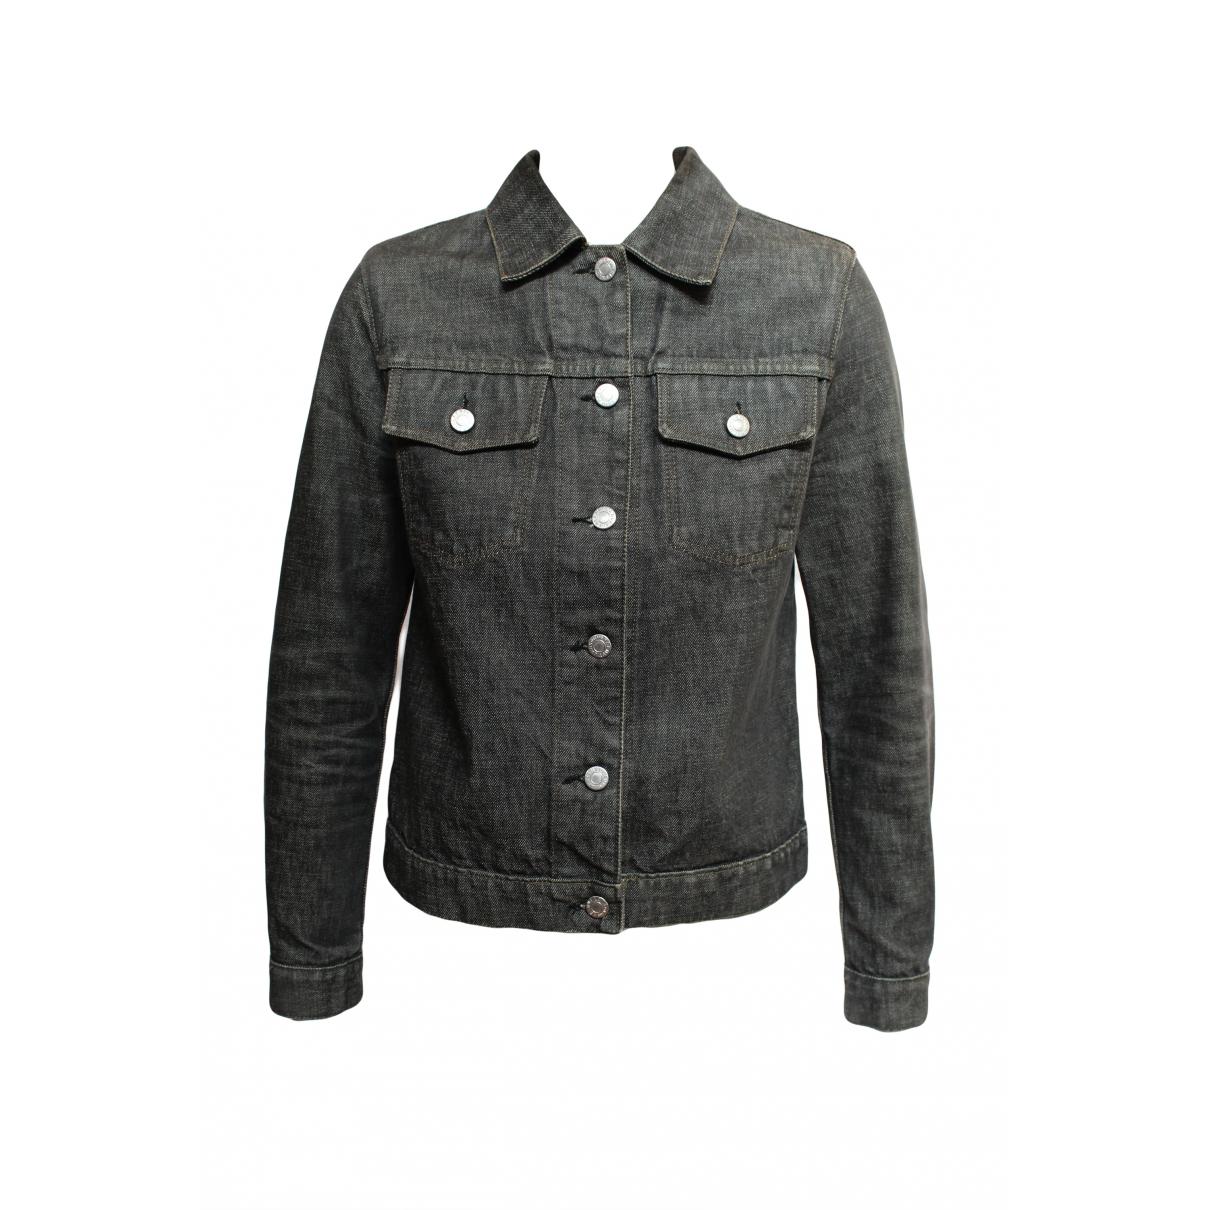 Helmut Lang \N Grey Denim - Jeans jacket for Women 38 IT